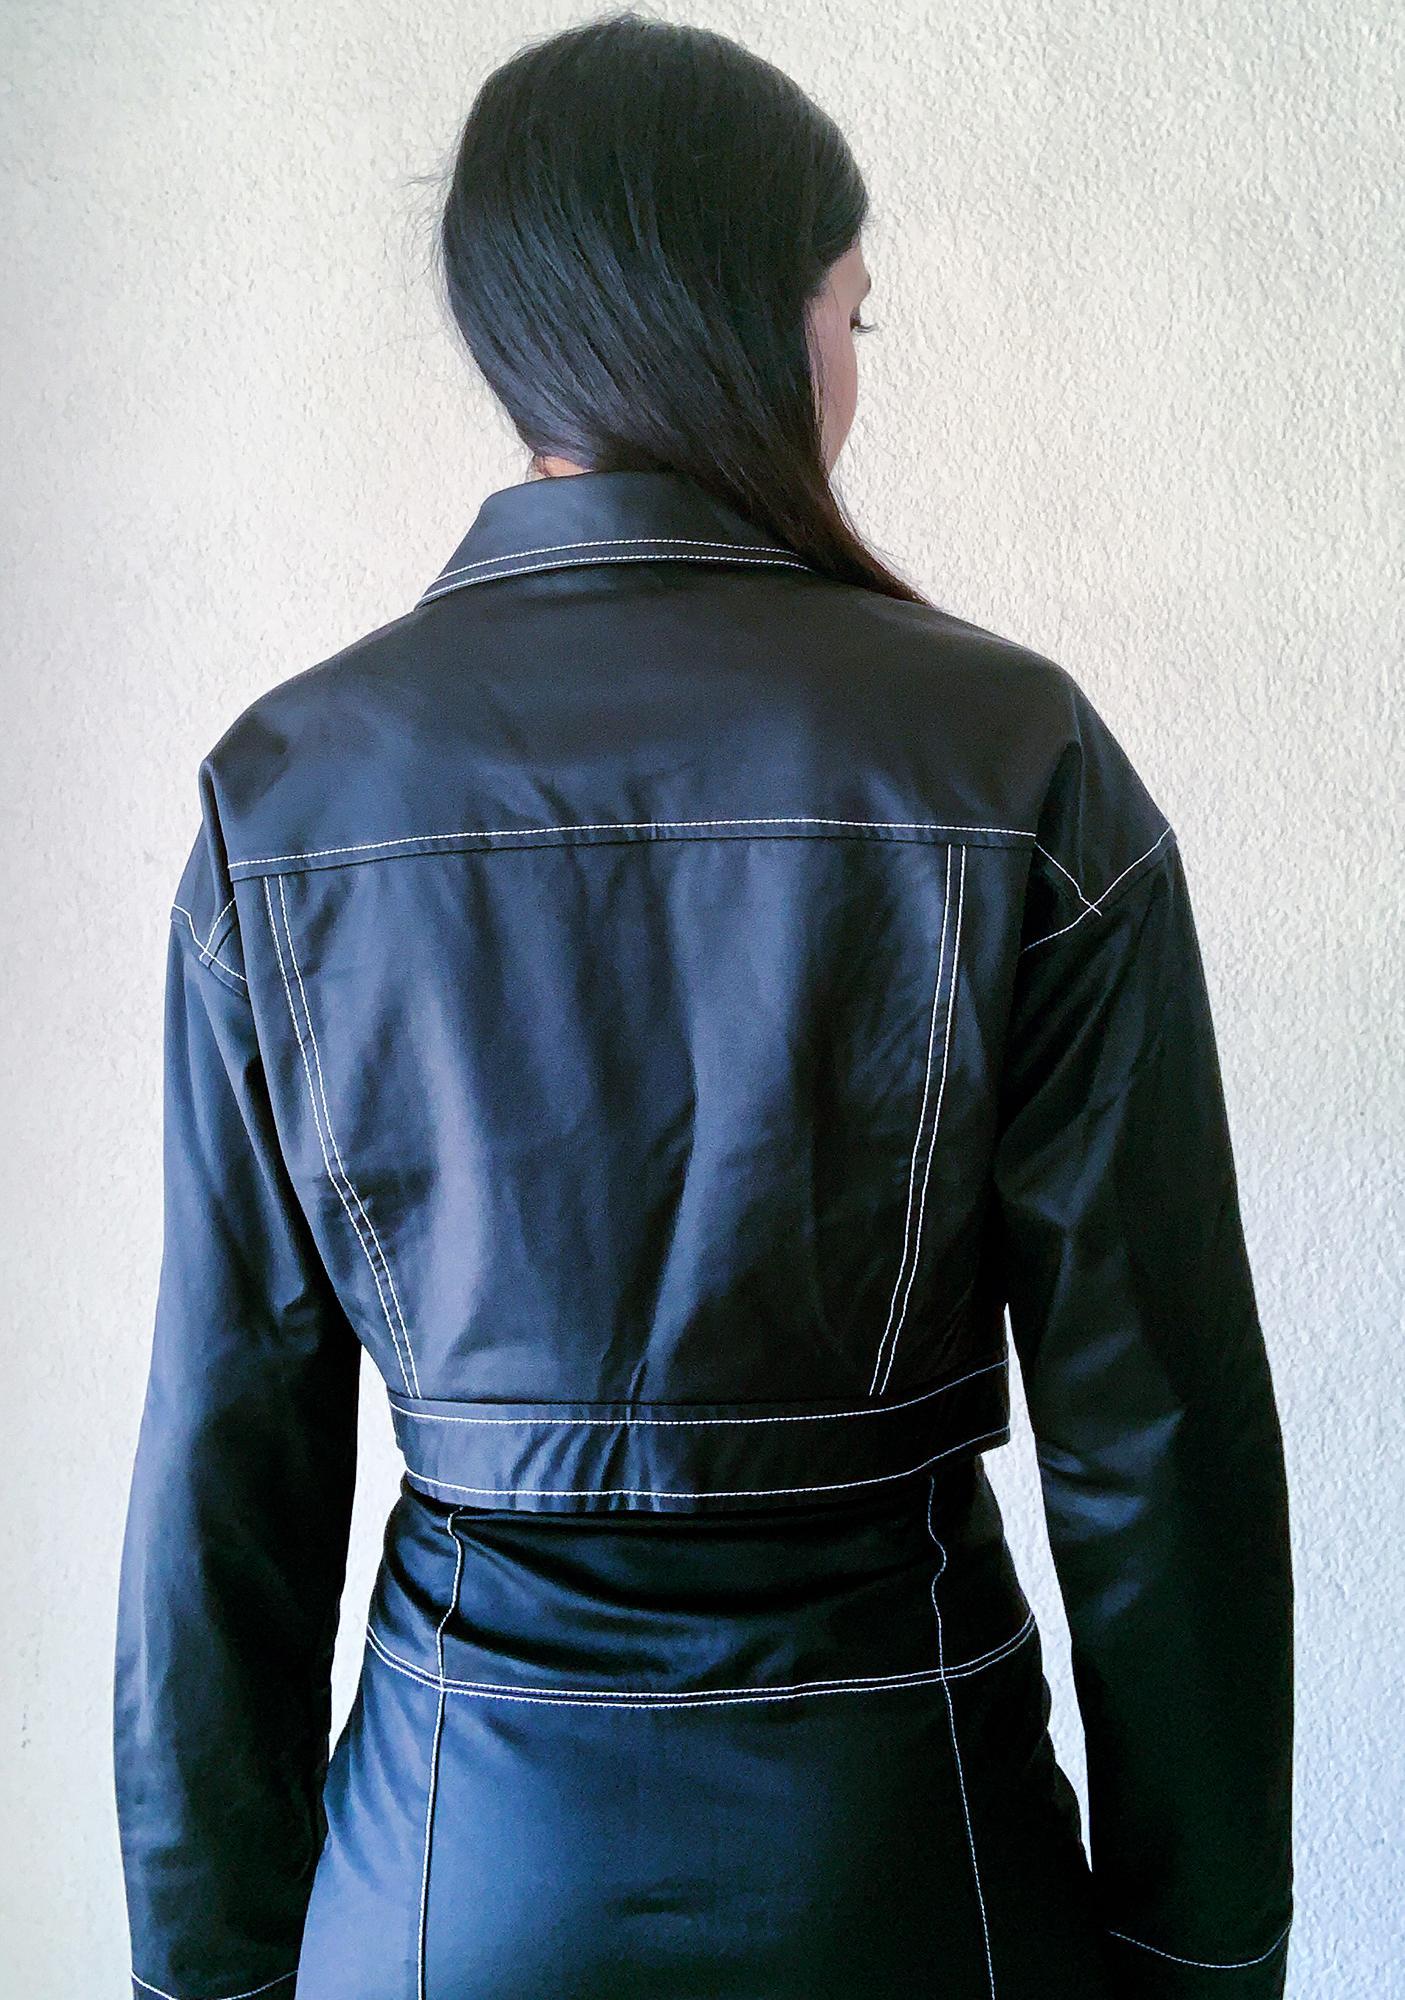 Poster Grl No Hard Feelingz Cropped Jacket